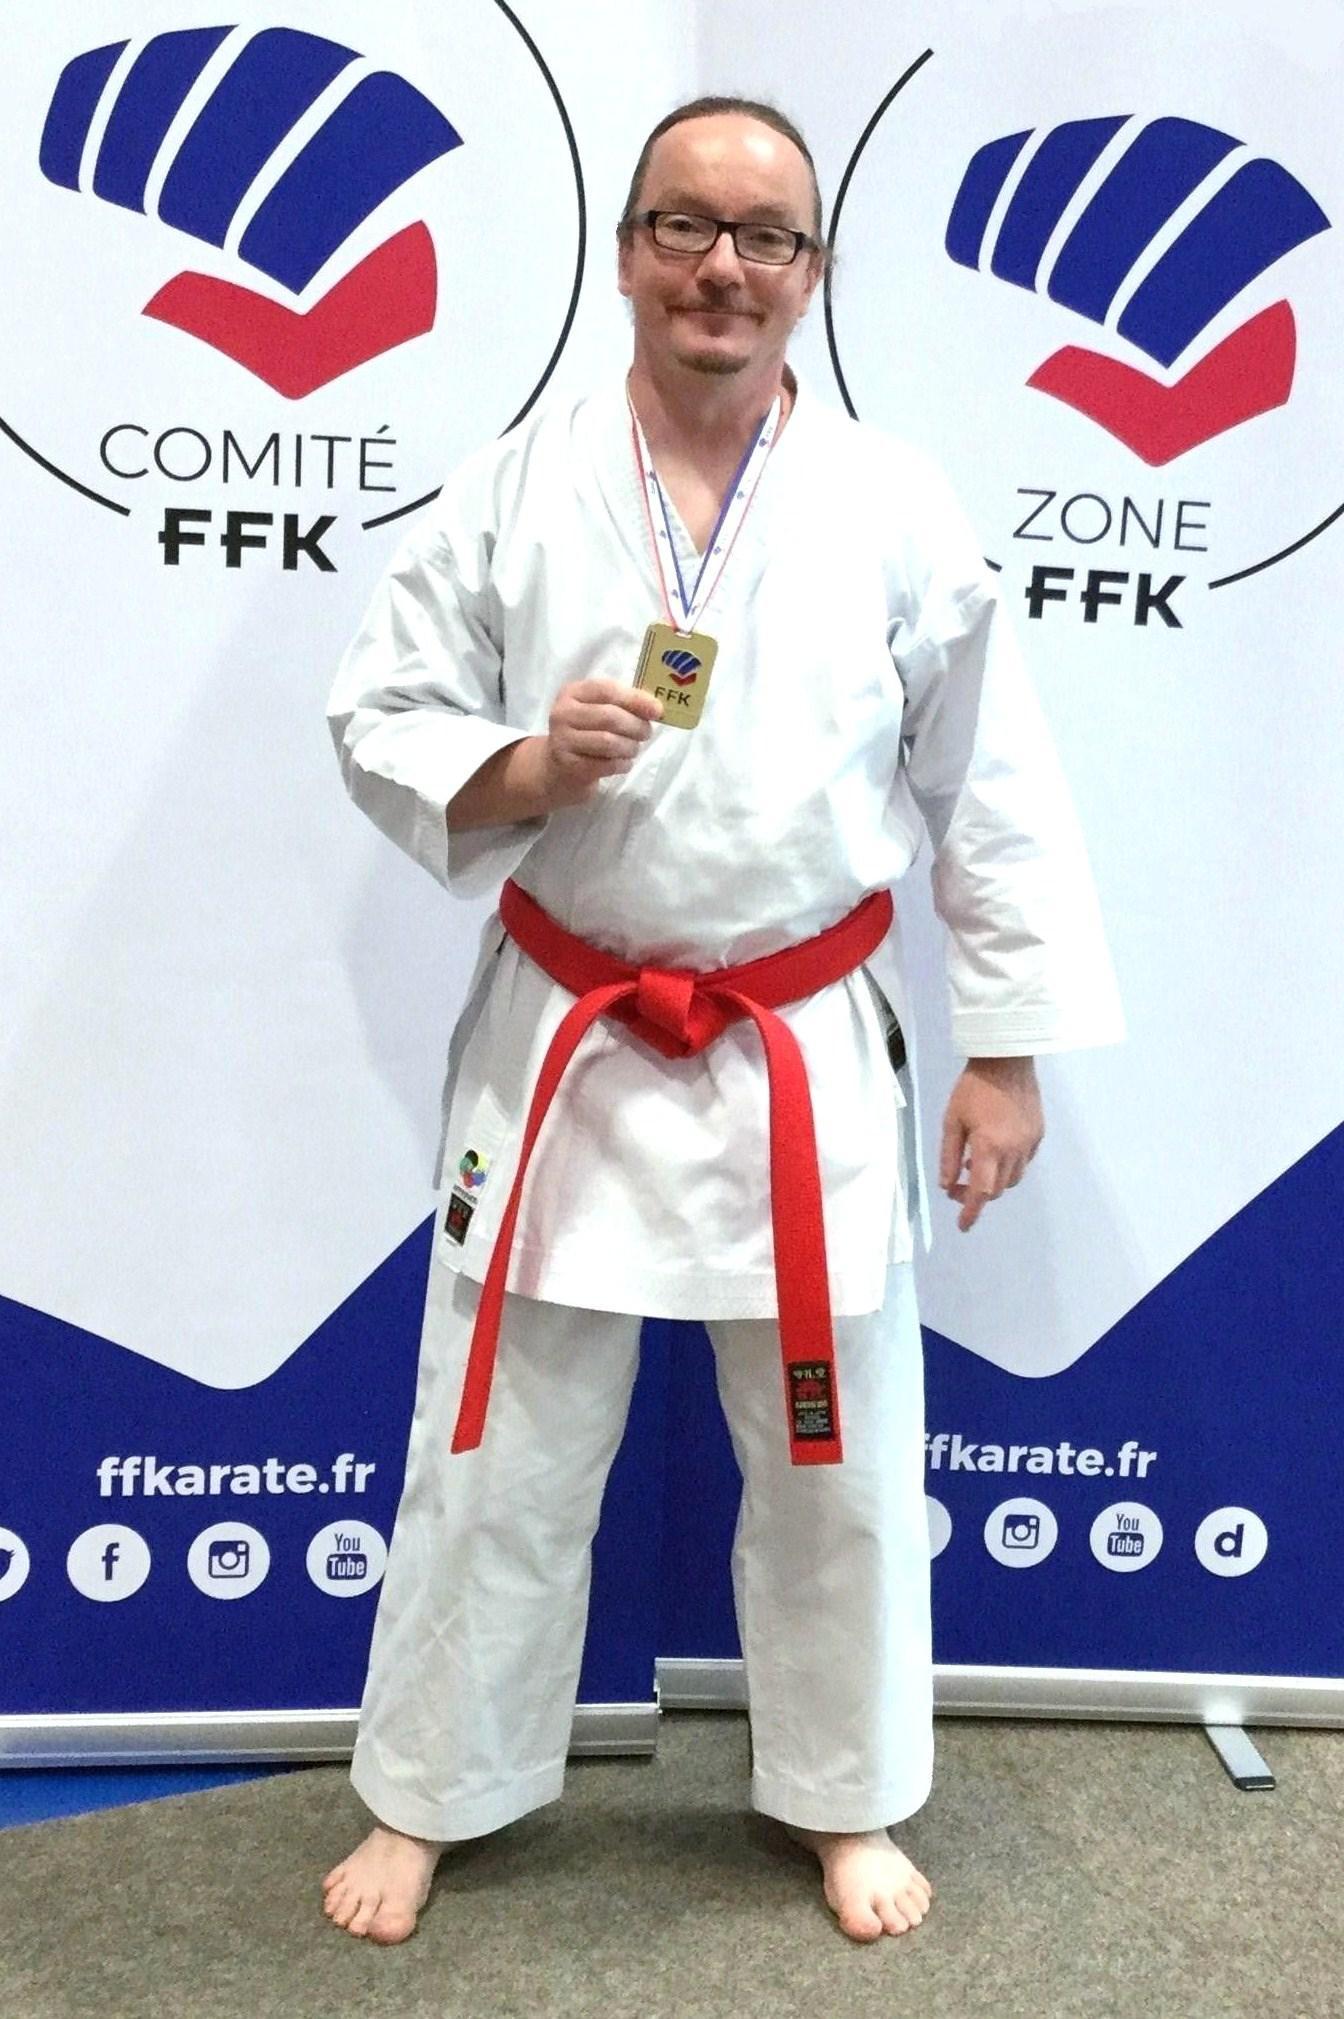 Sebastien Arlot champion de france 2018 karaté shotokan professeur AS KARATE DO